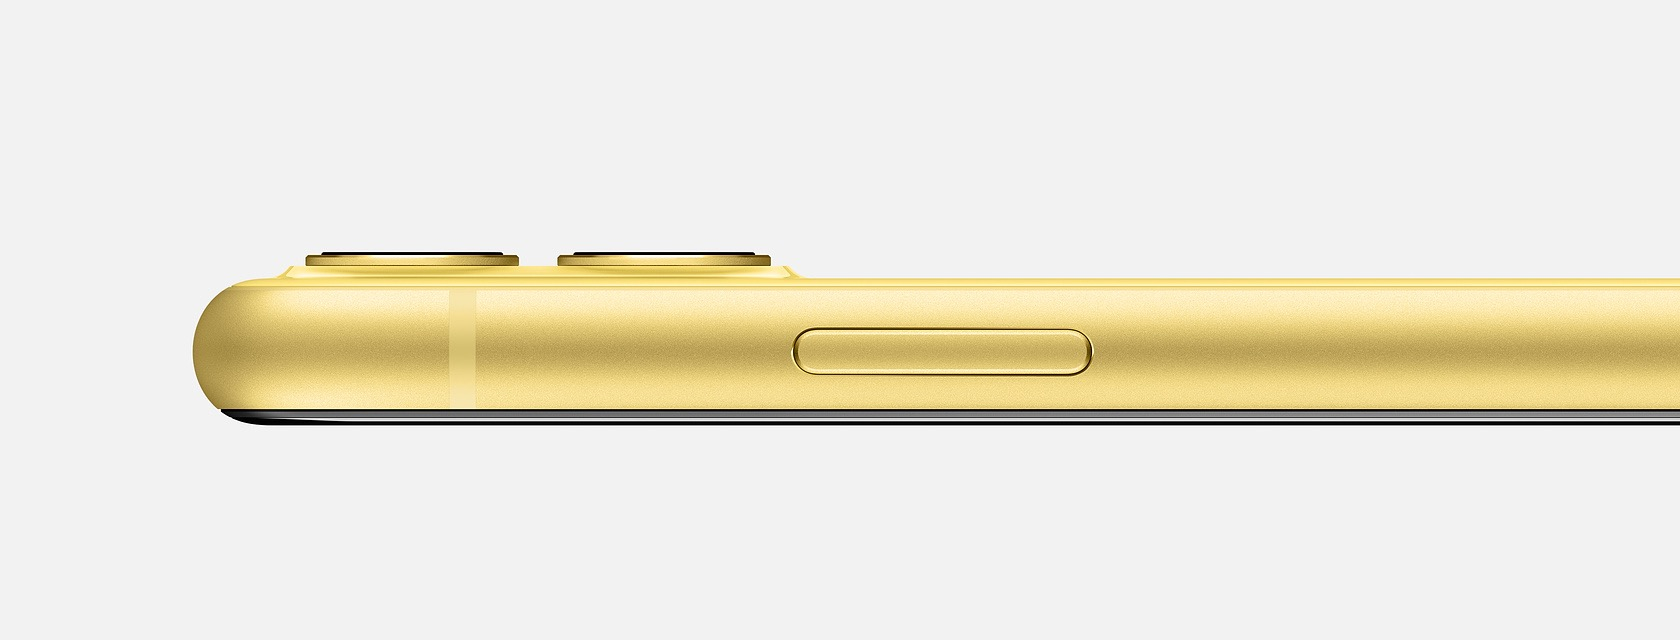 Profil de l'iPhone 11 jaune